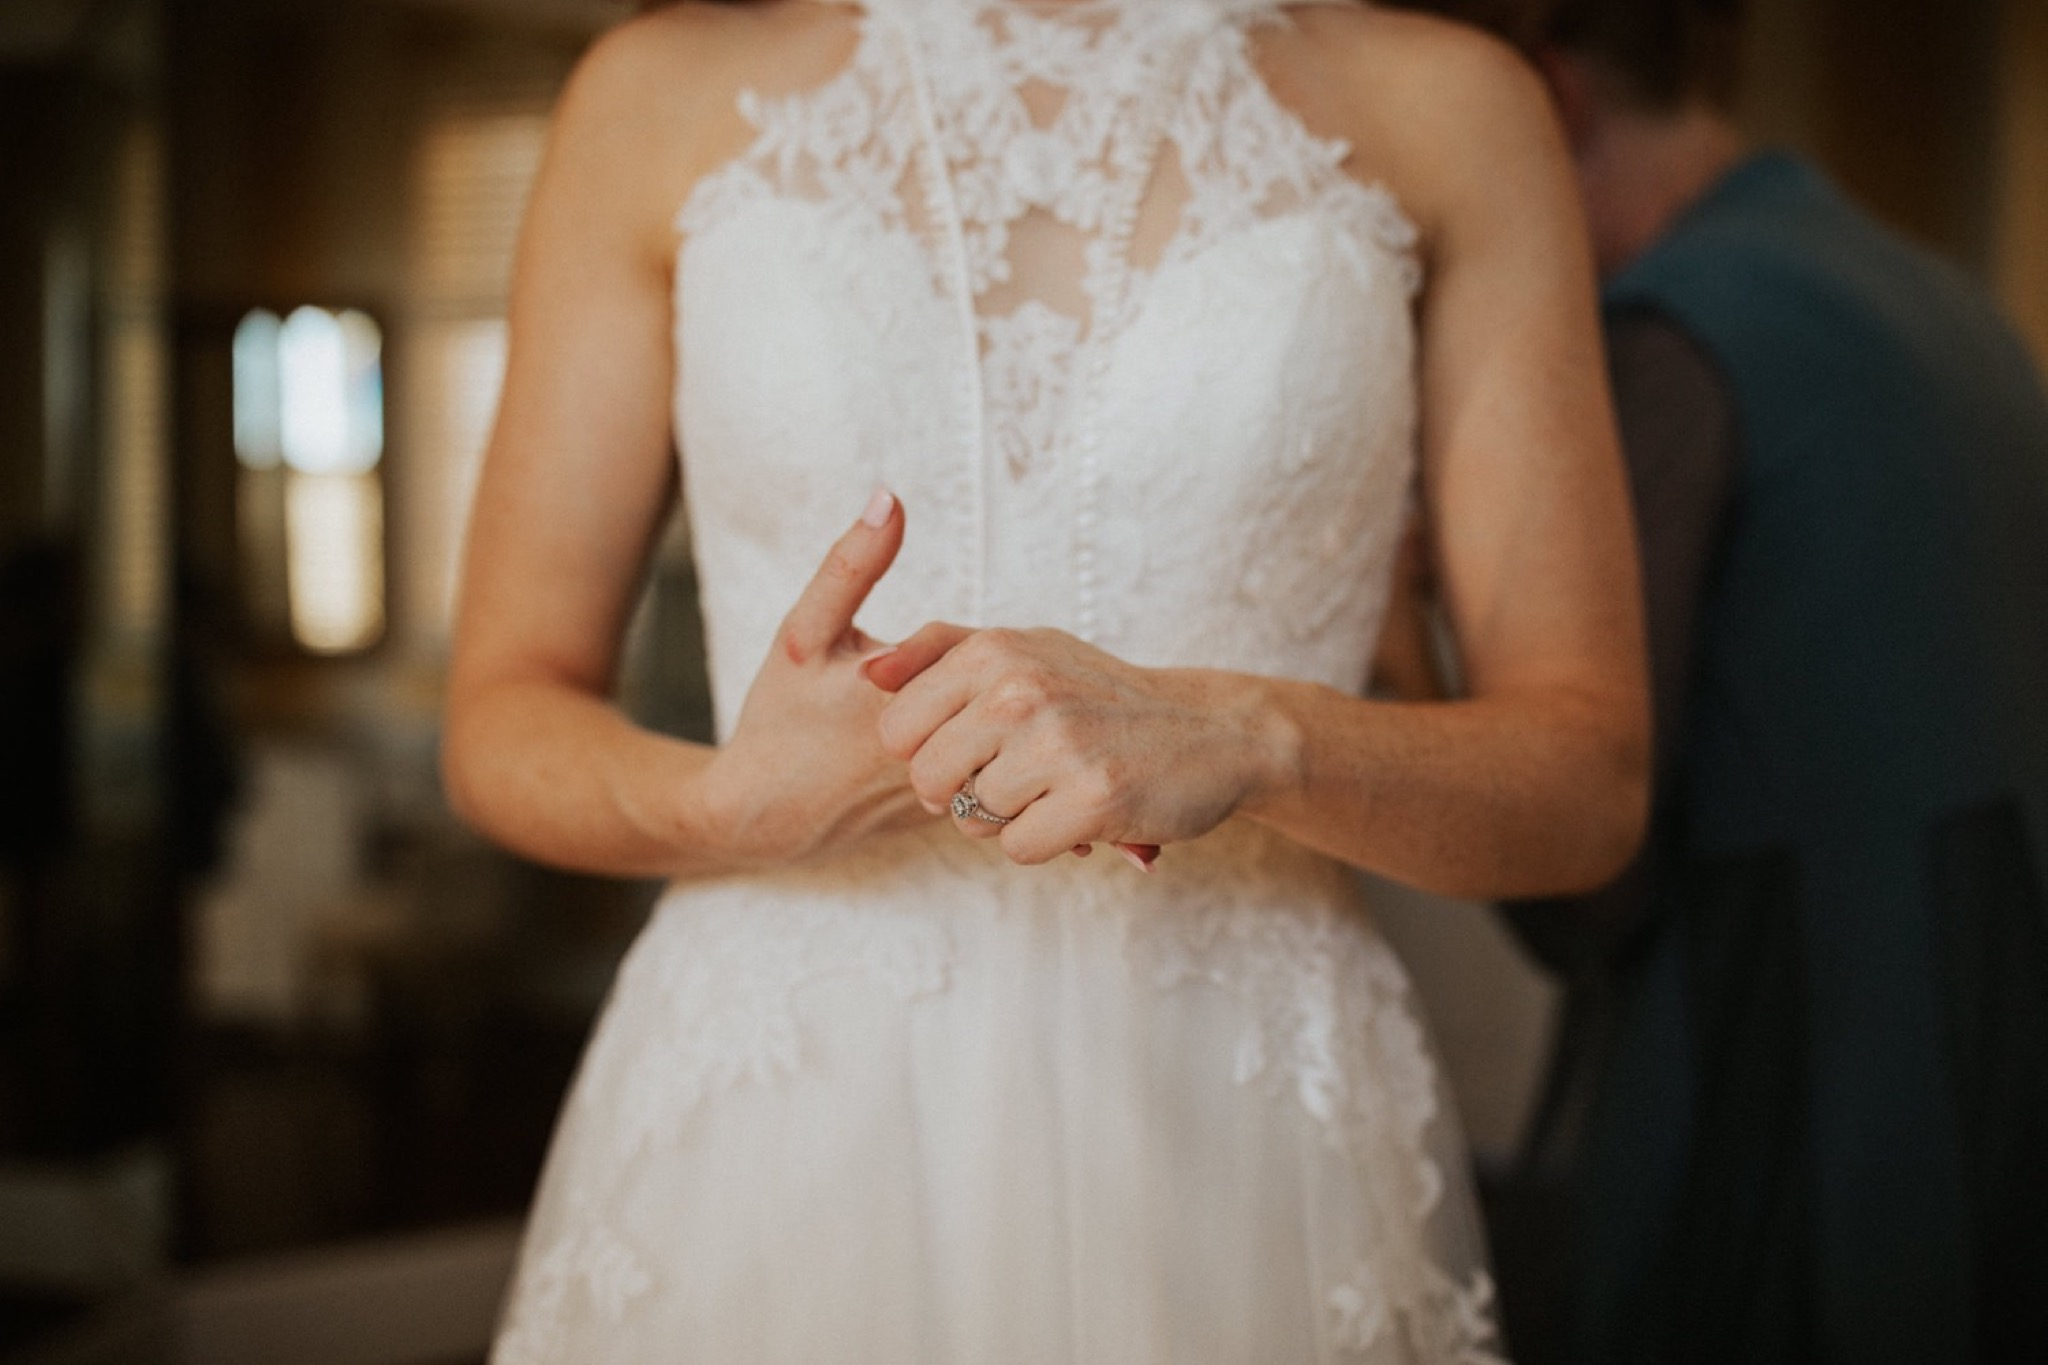 30_West Manor Estate Weddings - Pat Cori Photography-62_bride_VirginiaWeddingPhotographer_gettingready_WestManorEstate_Portraits_Wedding.jpg